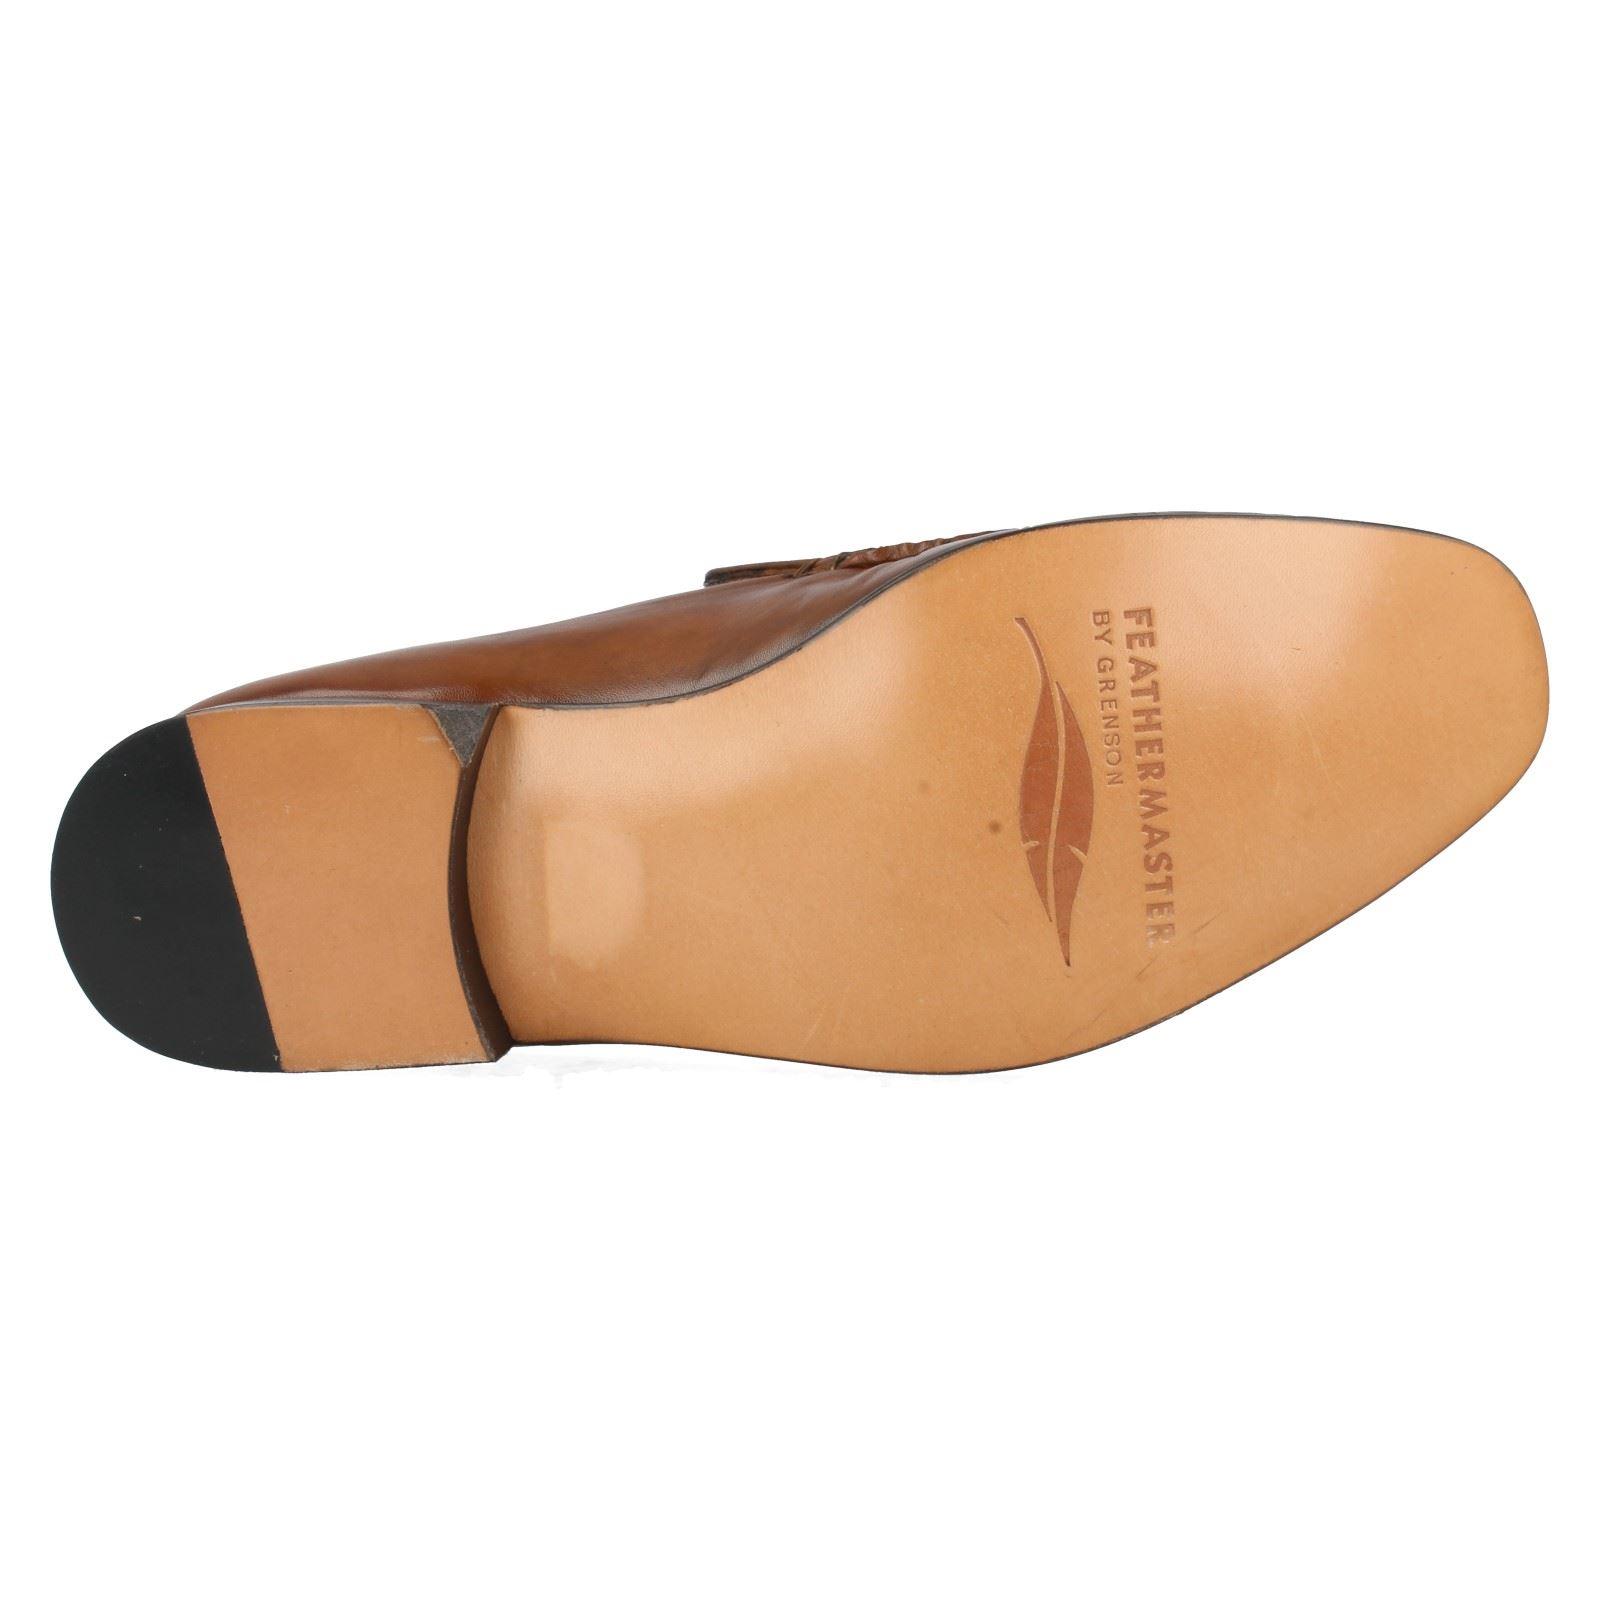 Herren Grenson feathermaster formelle Mokassins passend f Style - Nevada 9685